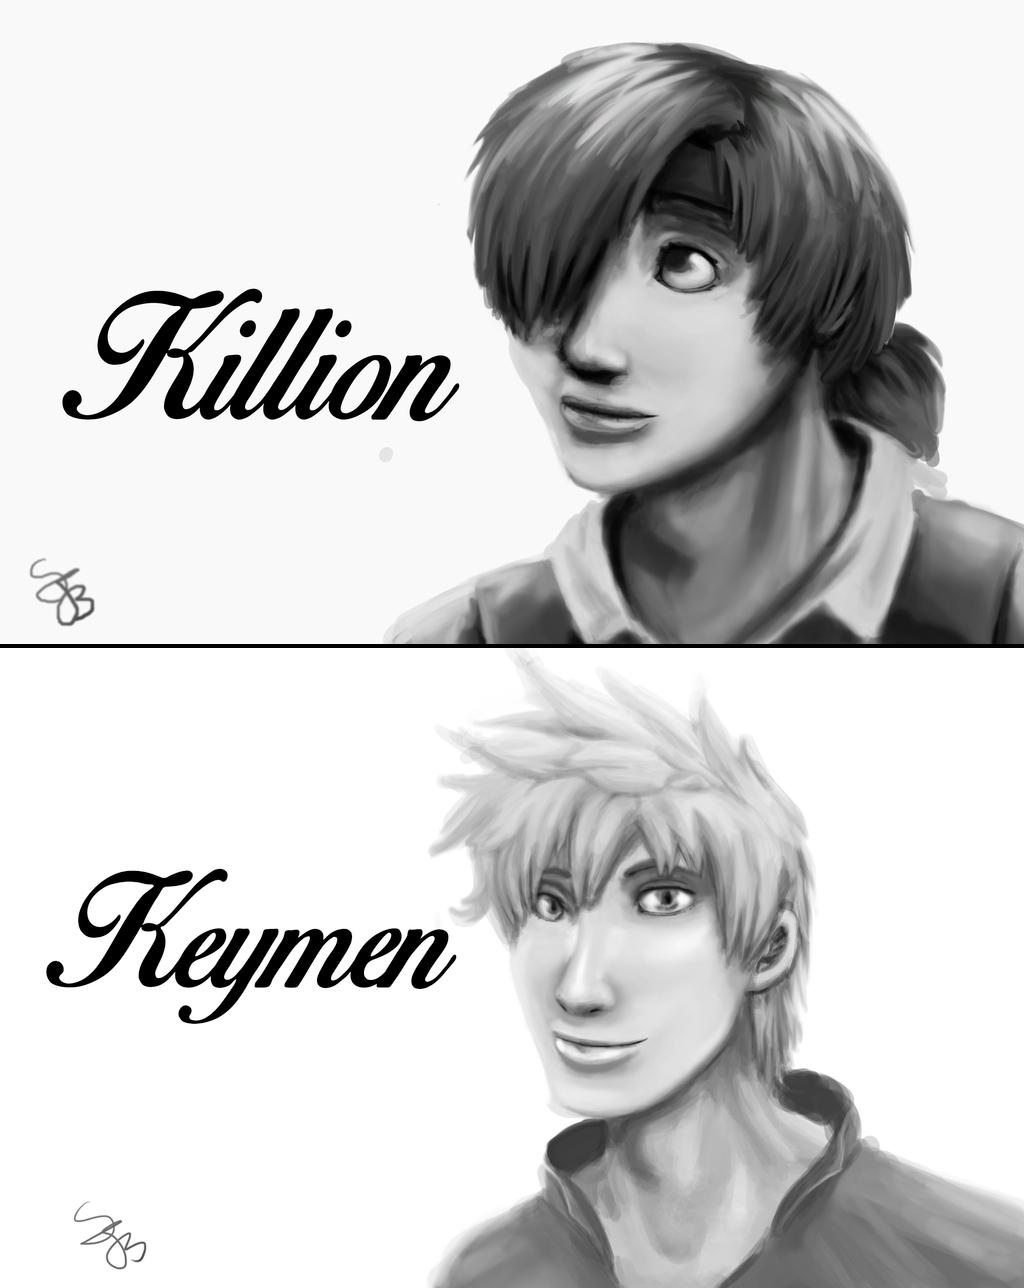 Kilion and Keymen by Dreamfollower